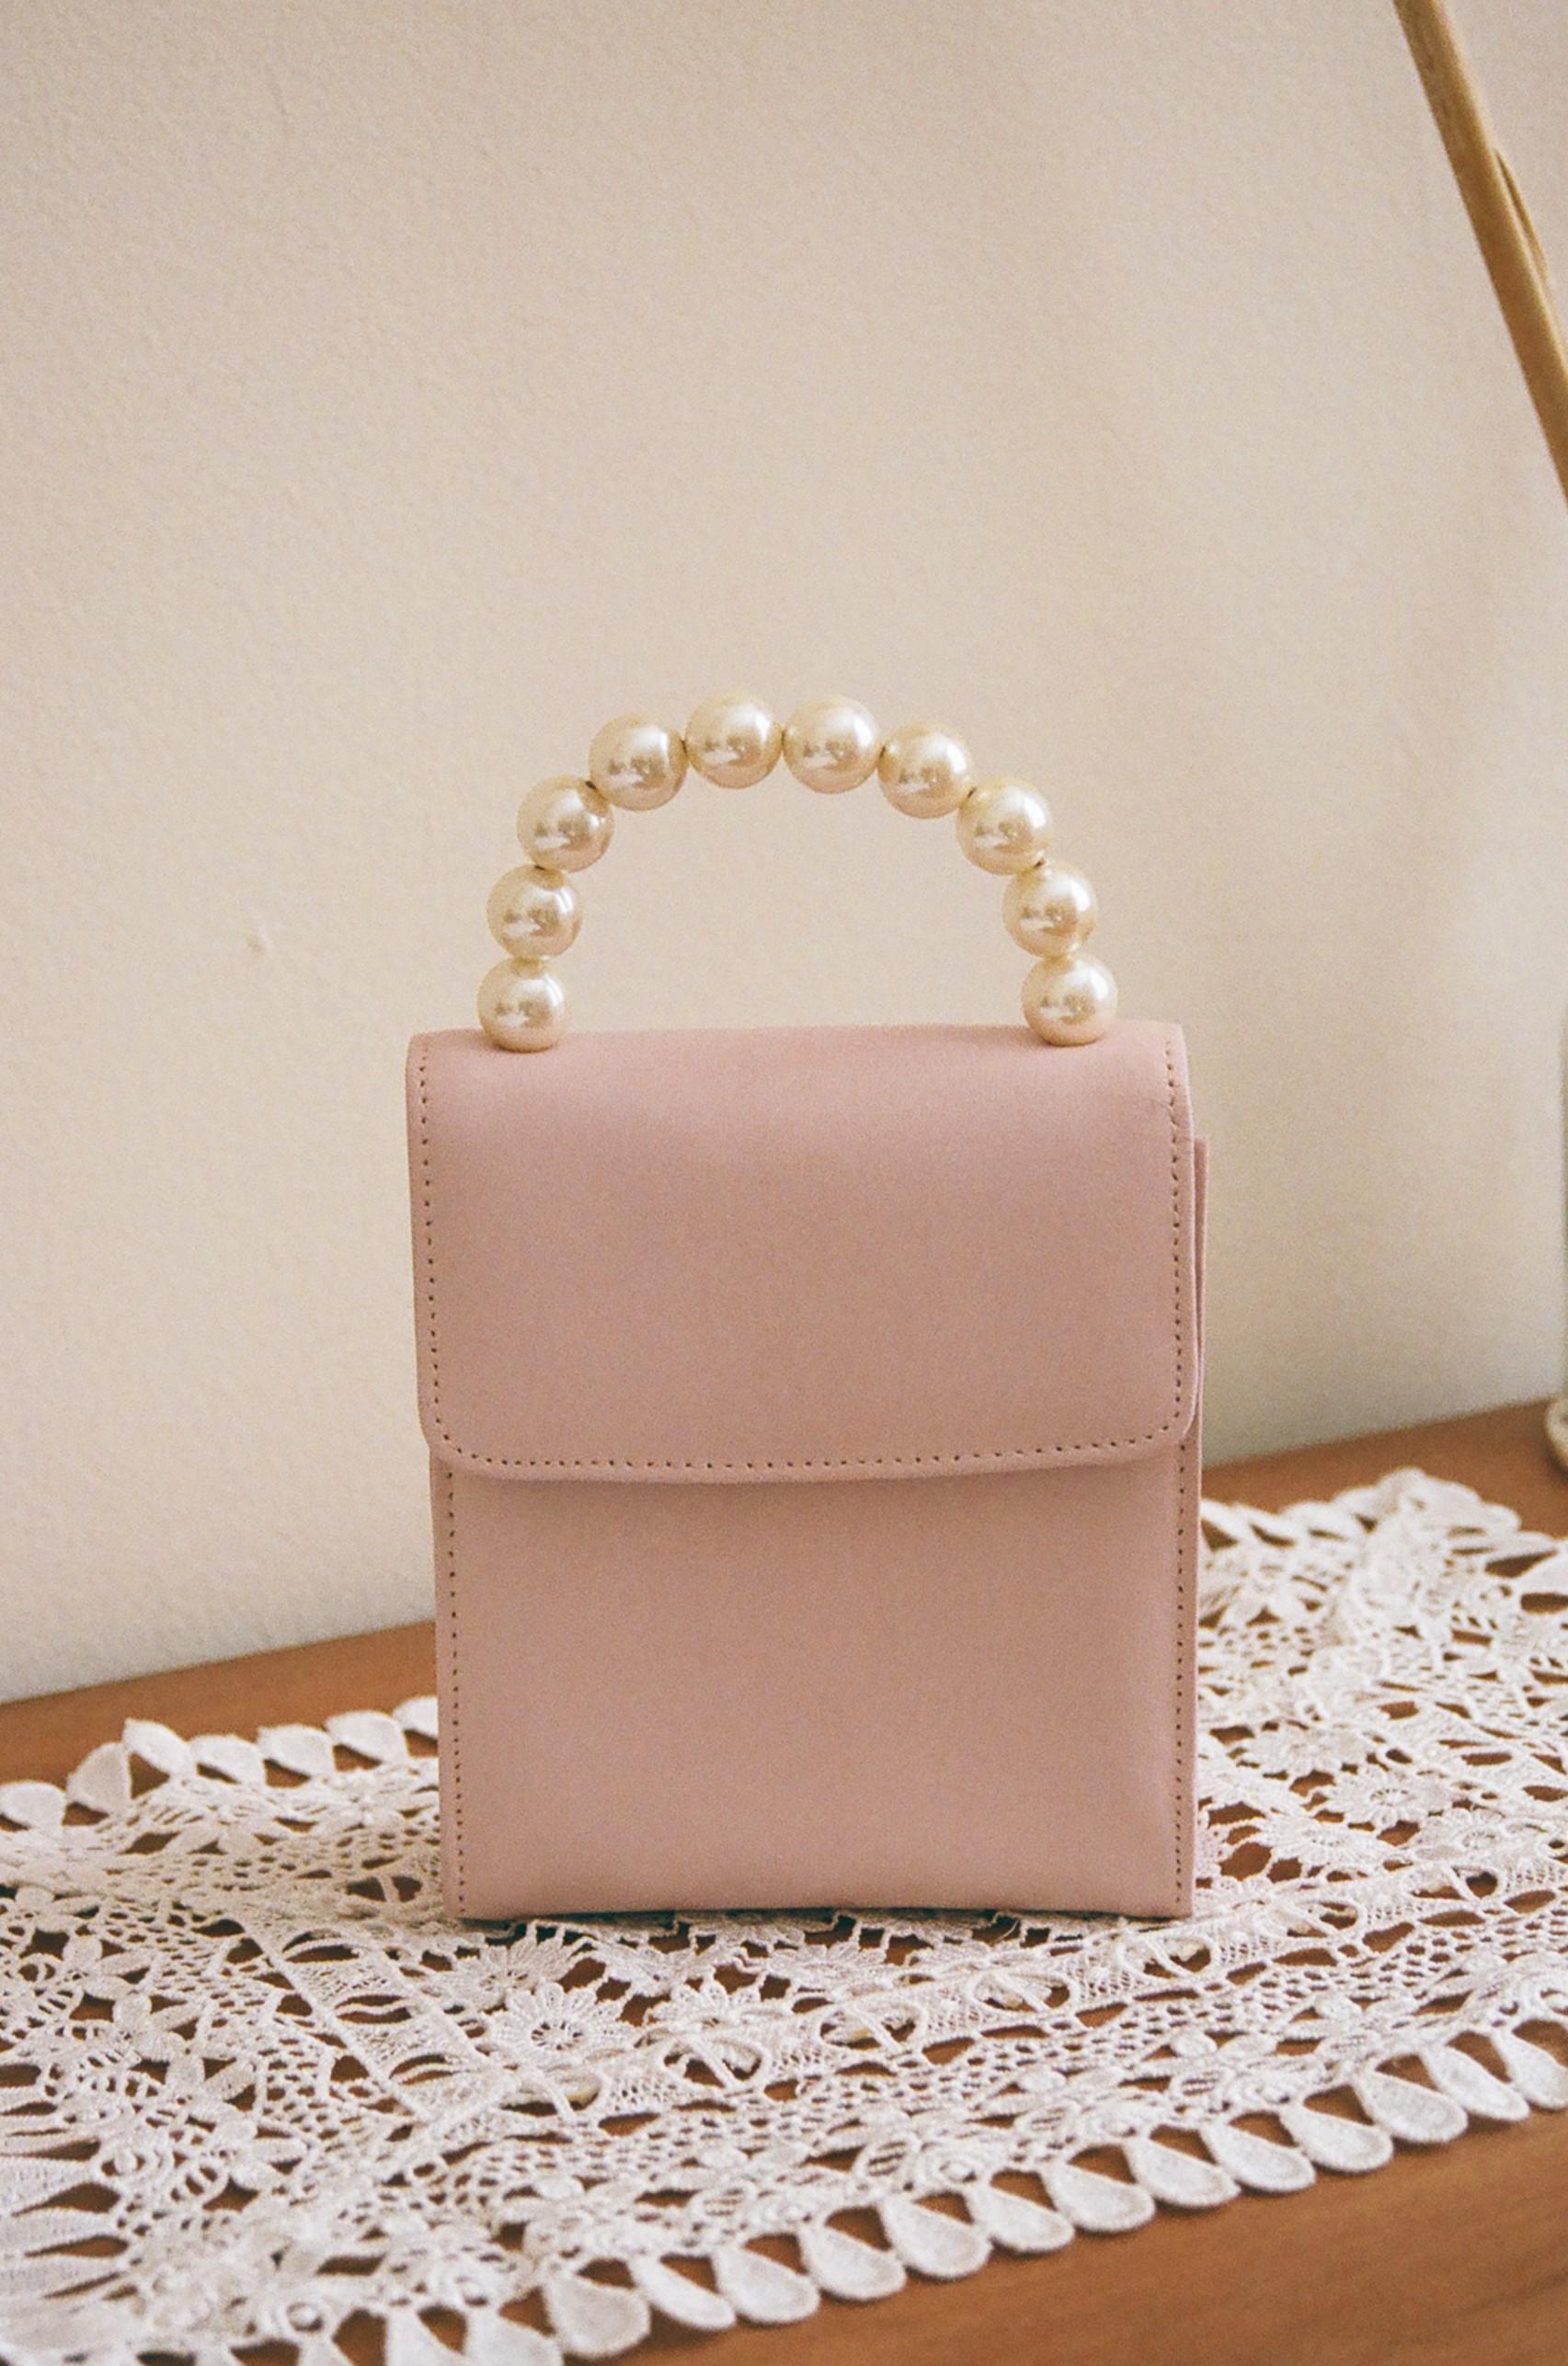 pearl handle purse 3.jpg